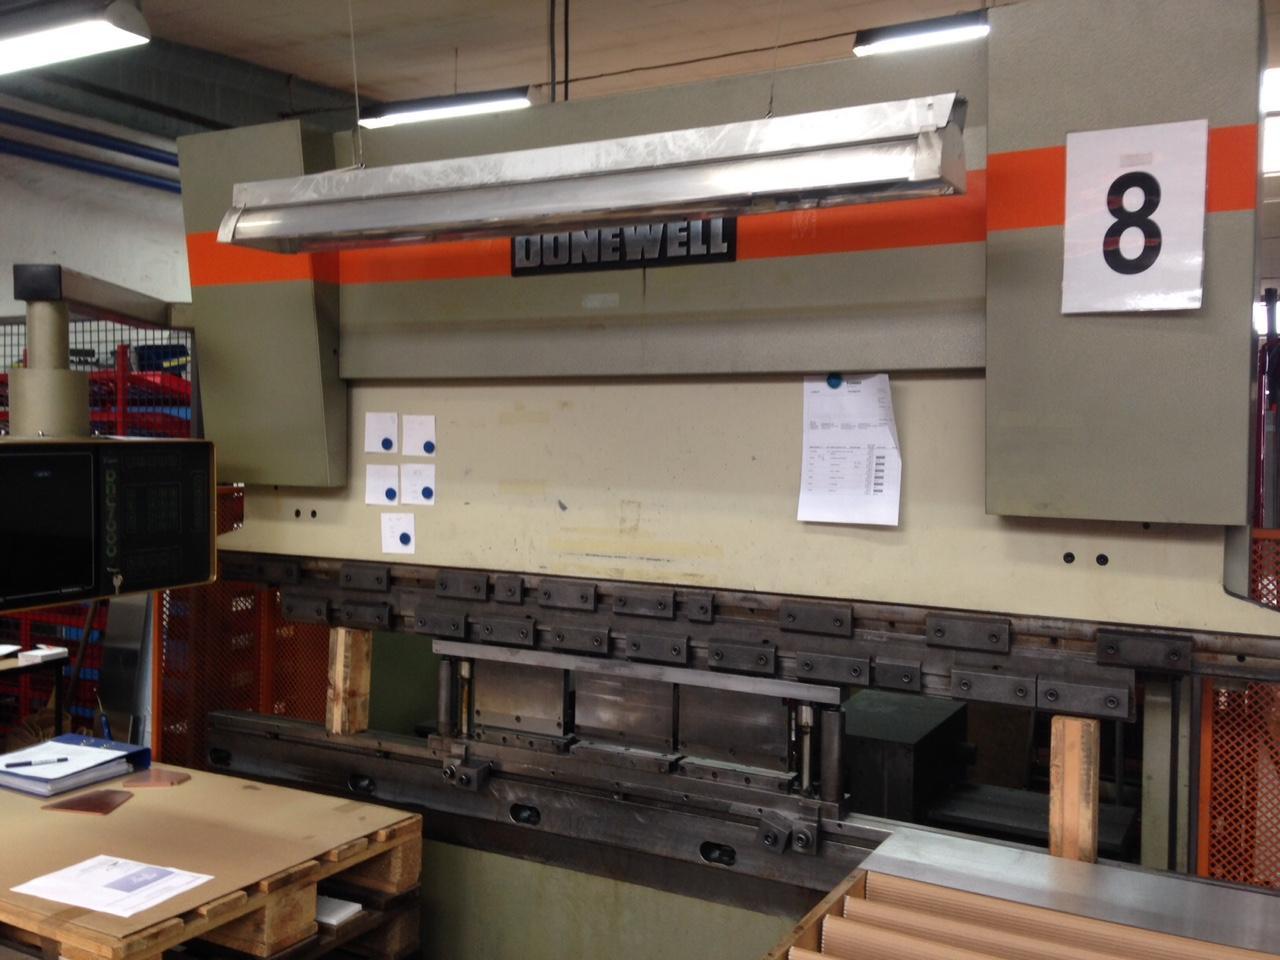 Donewell kantpresse H80t-2500mm